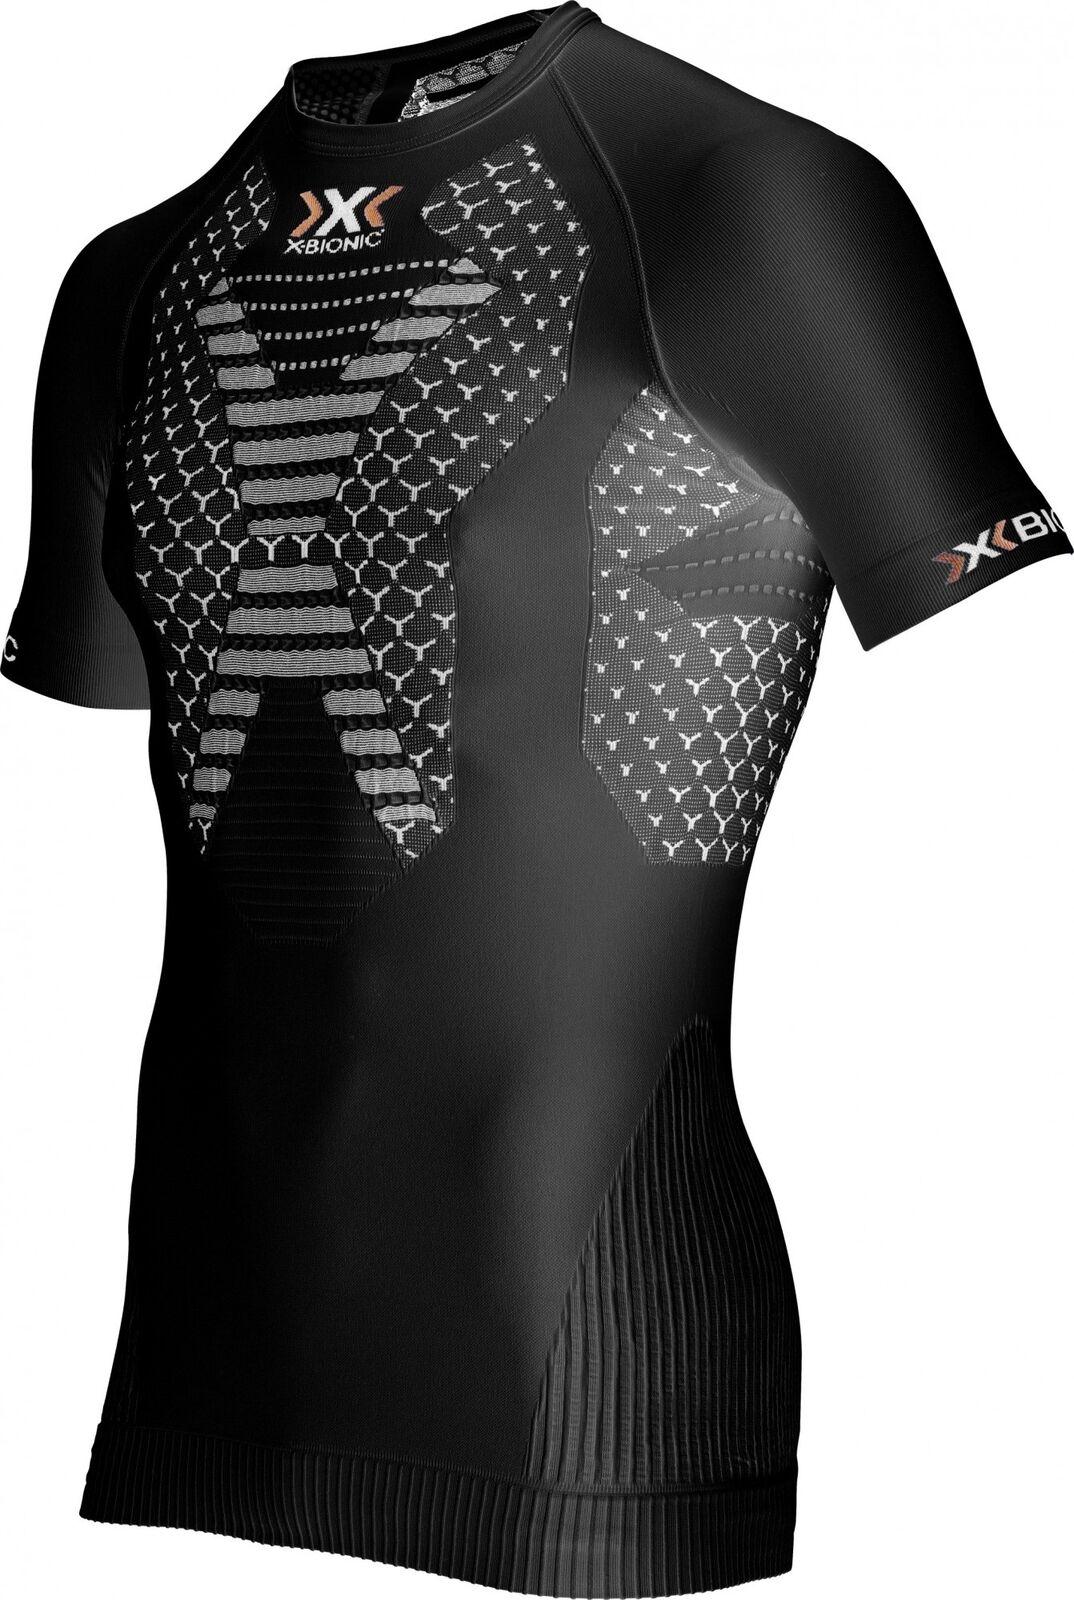 X-Bionic Funktionsshirt TTWYCE Running Shirt Laufshirt Runningoberteil Funktionsshirt X-Bionic T-Shirt 5bab78